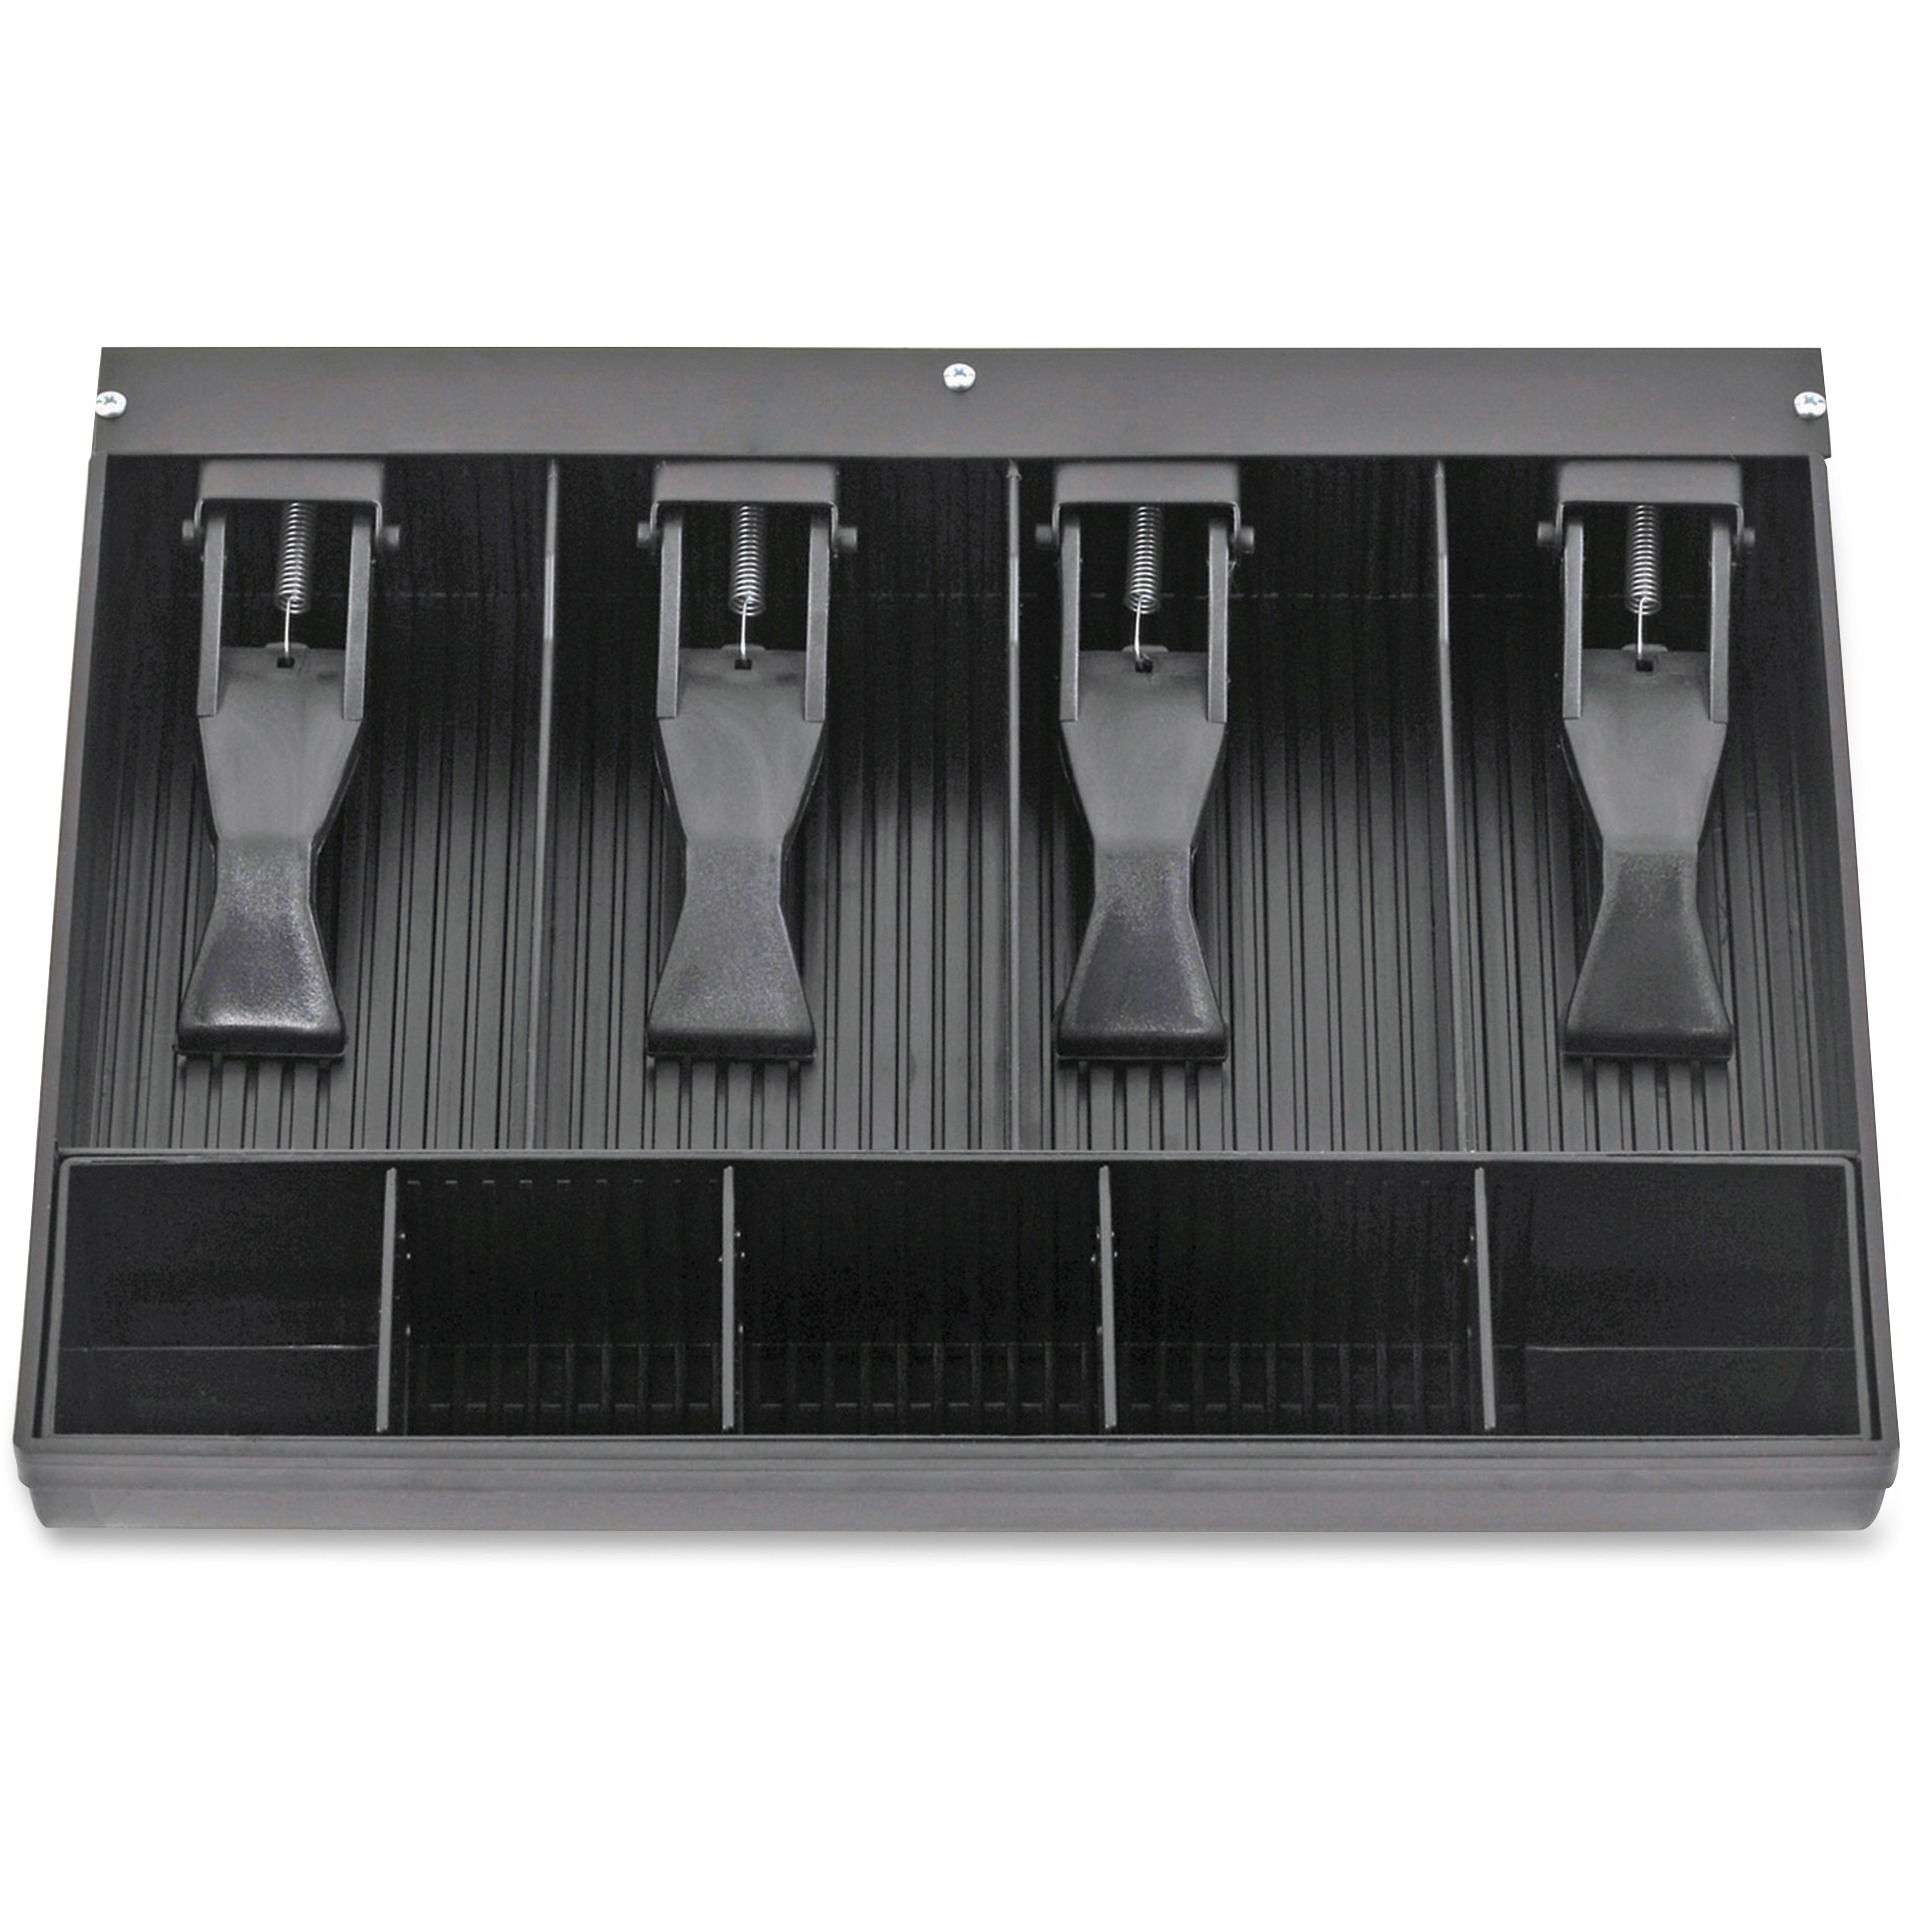 MMF, MMF2252843T04, SteelMaster Tch.Release Cash Drawer, 1, Black